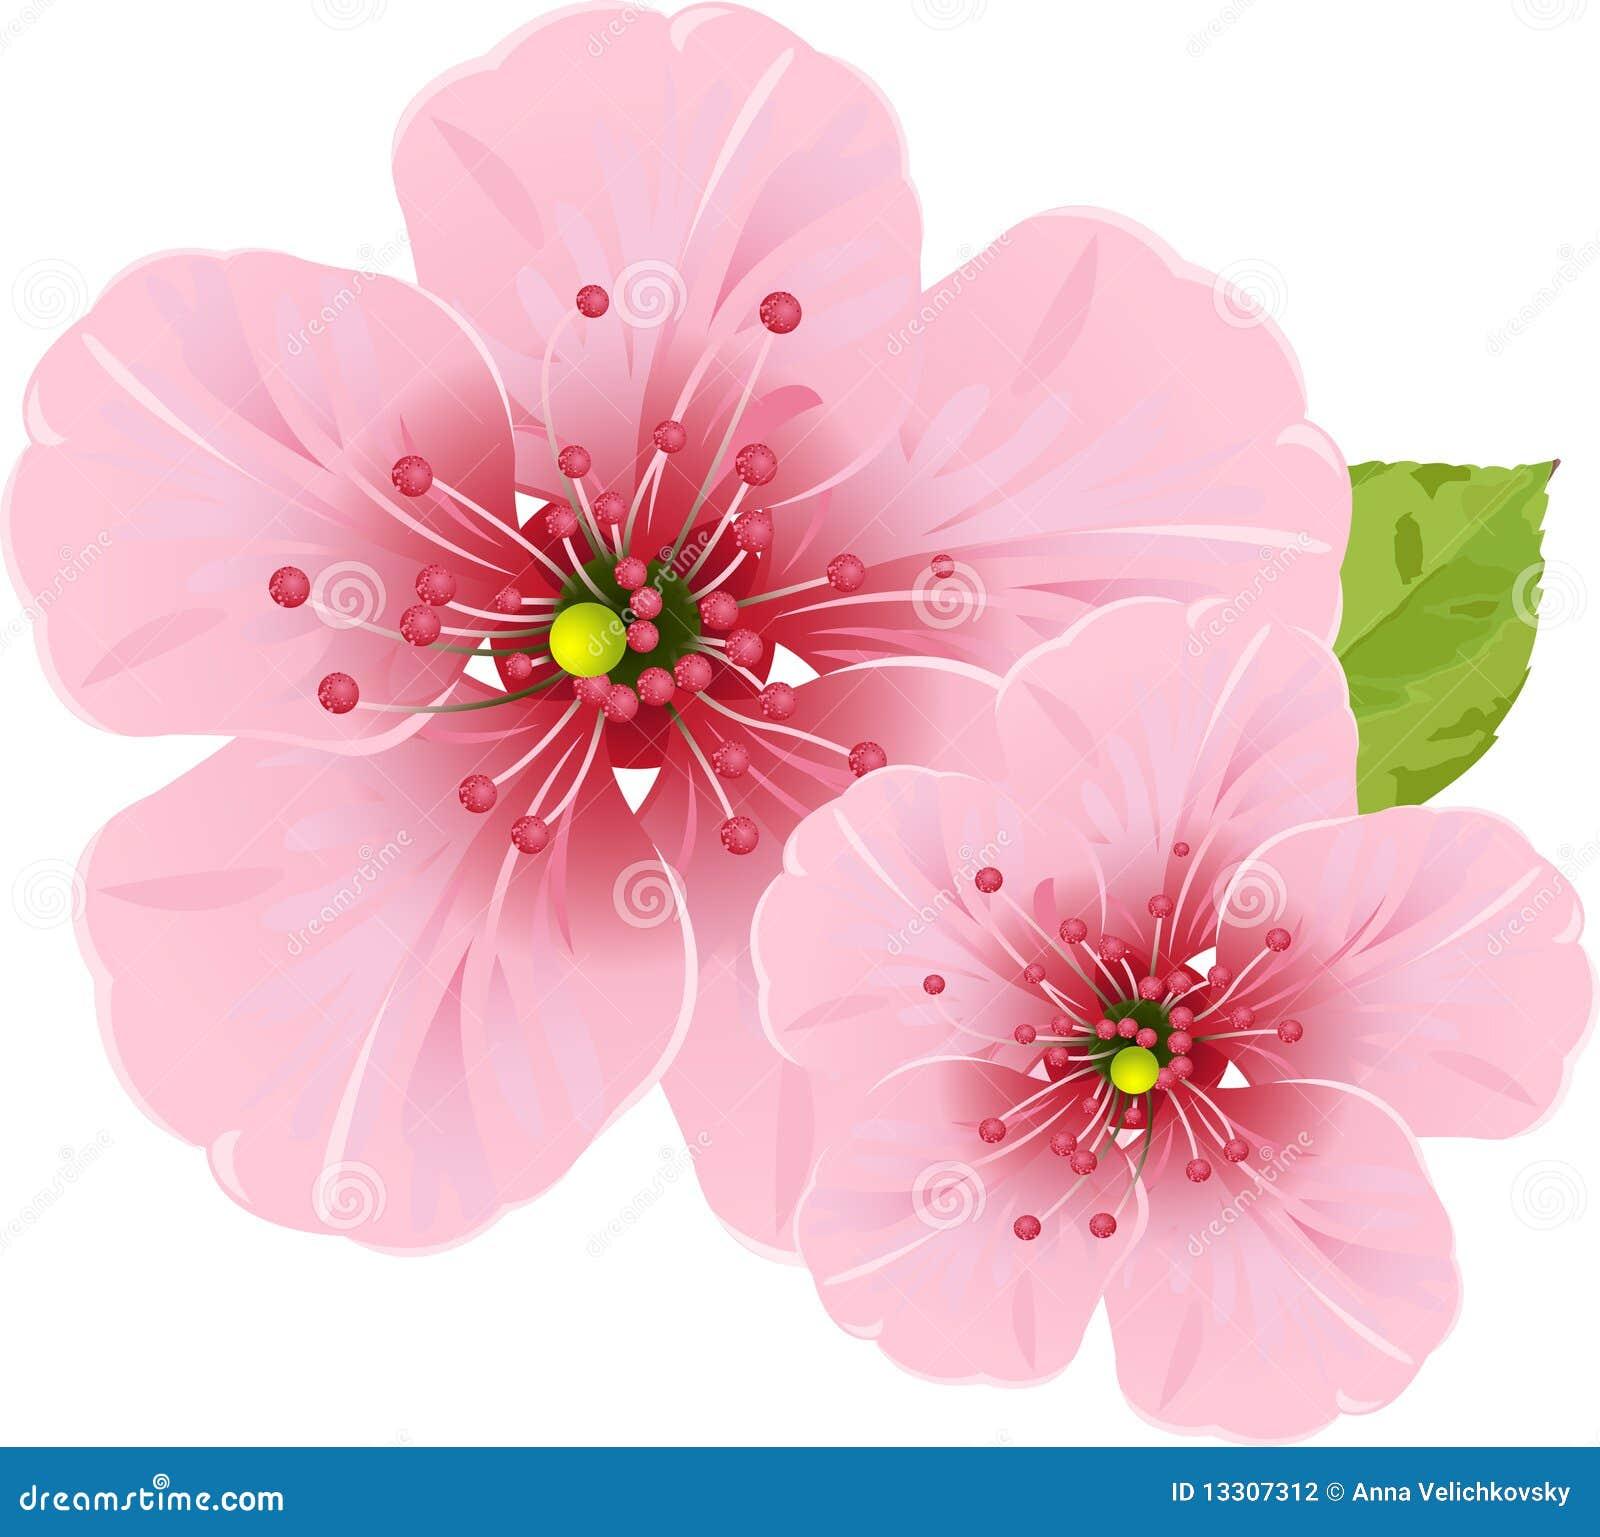 Kirschblütenblumen